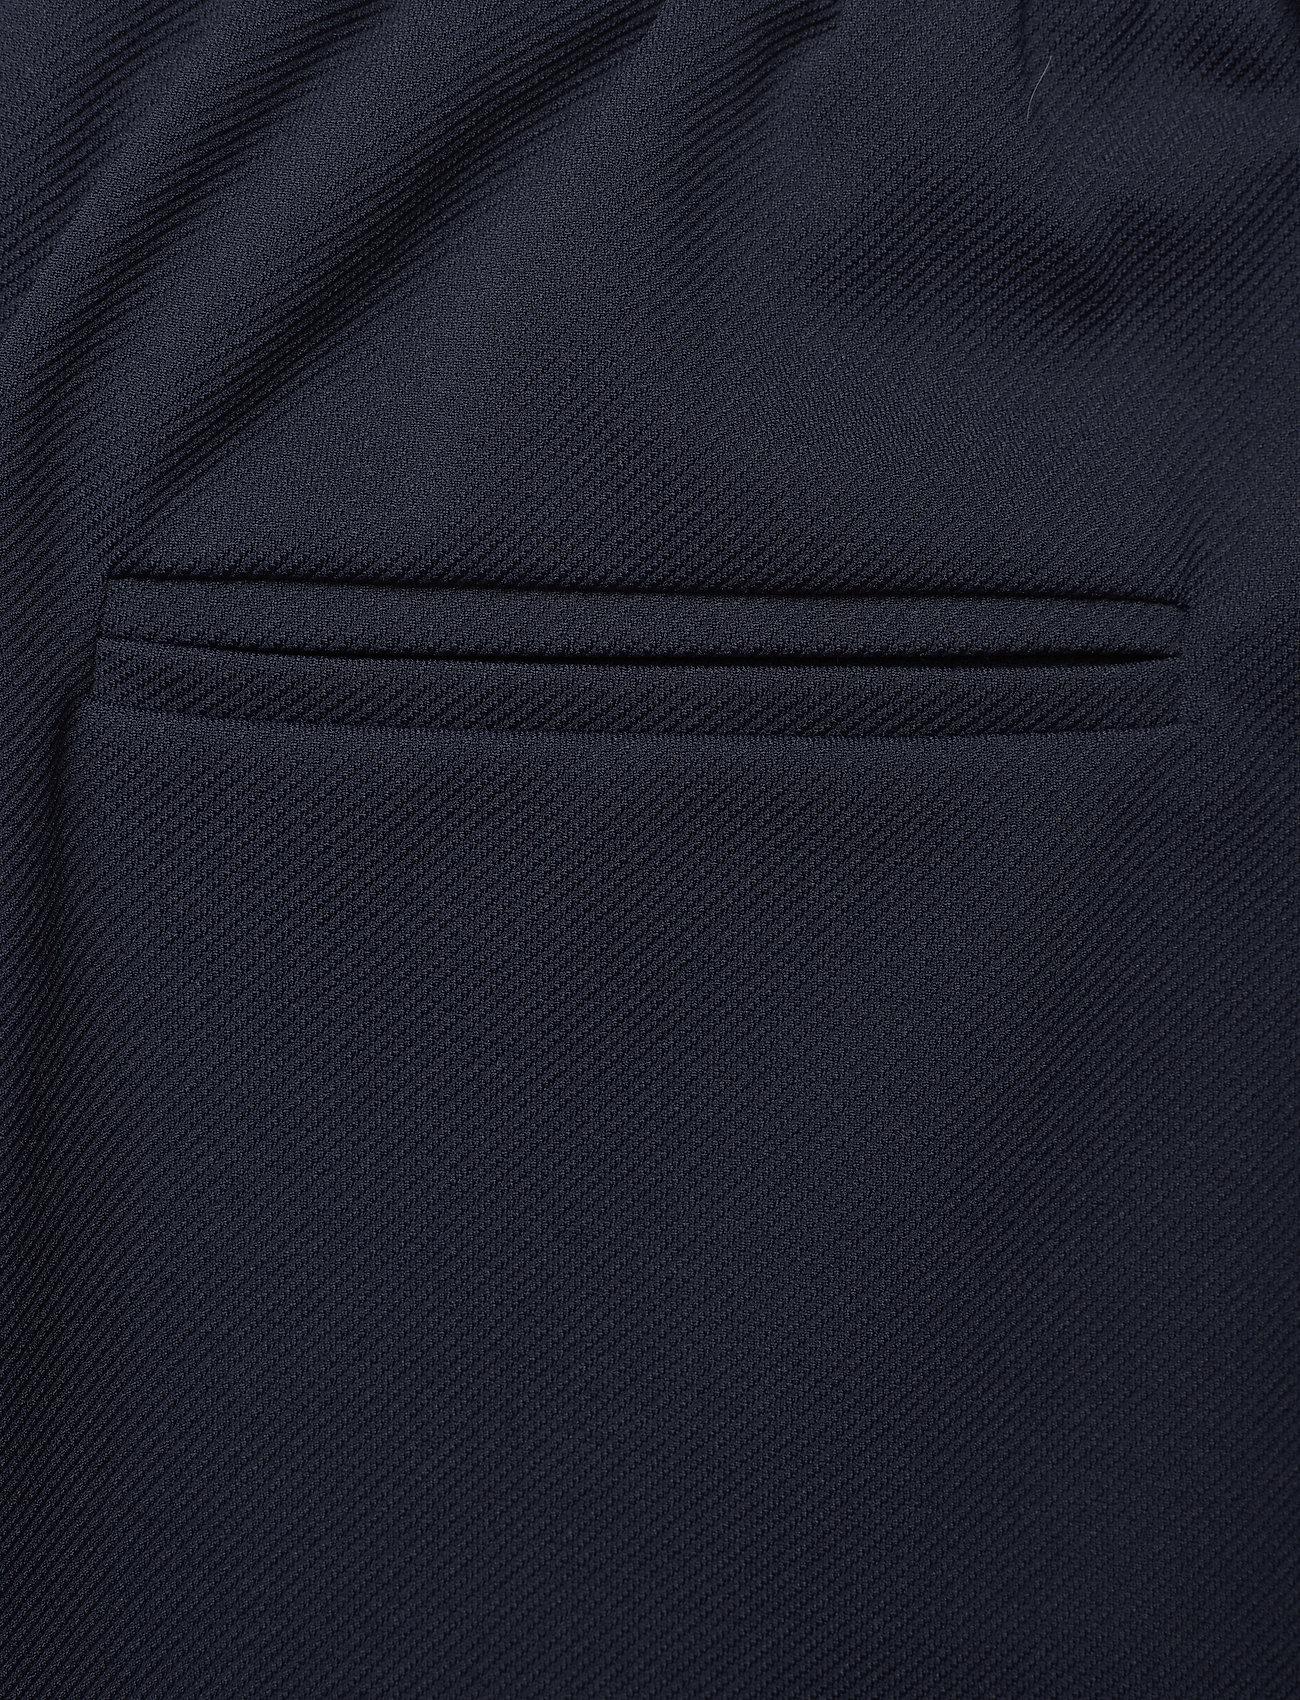 Max Mara Leisure - MILENA - wide leg trousers - navy - 3